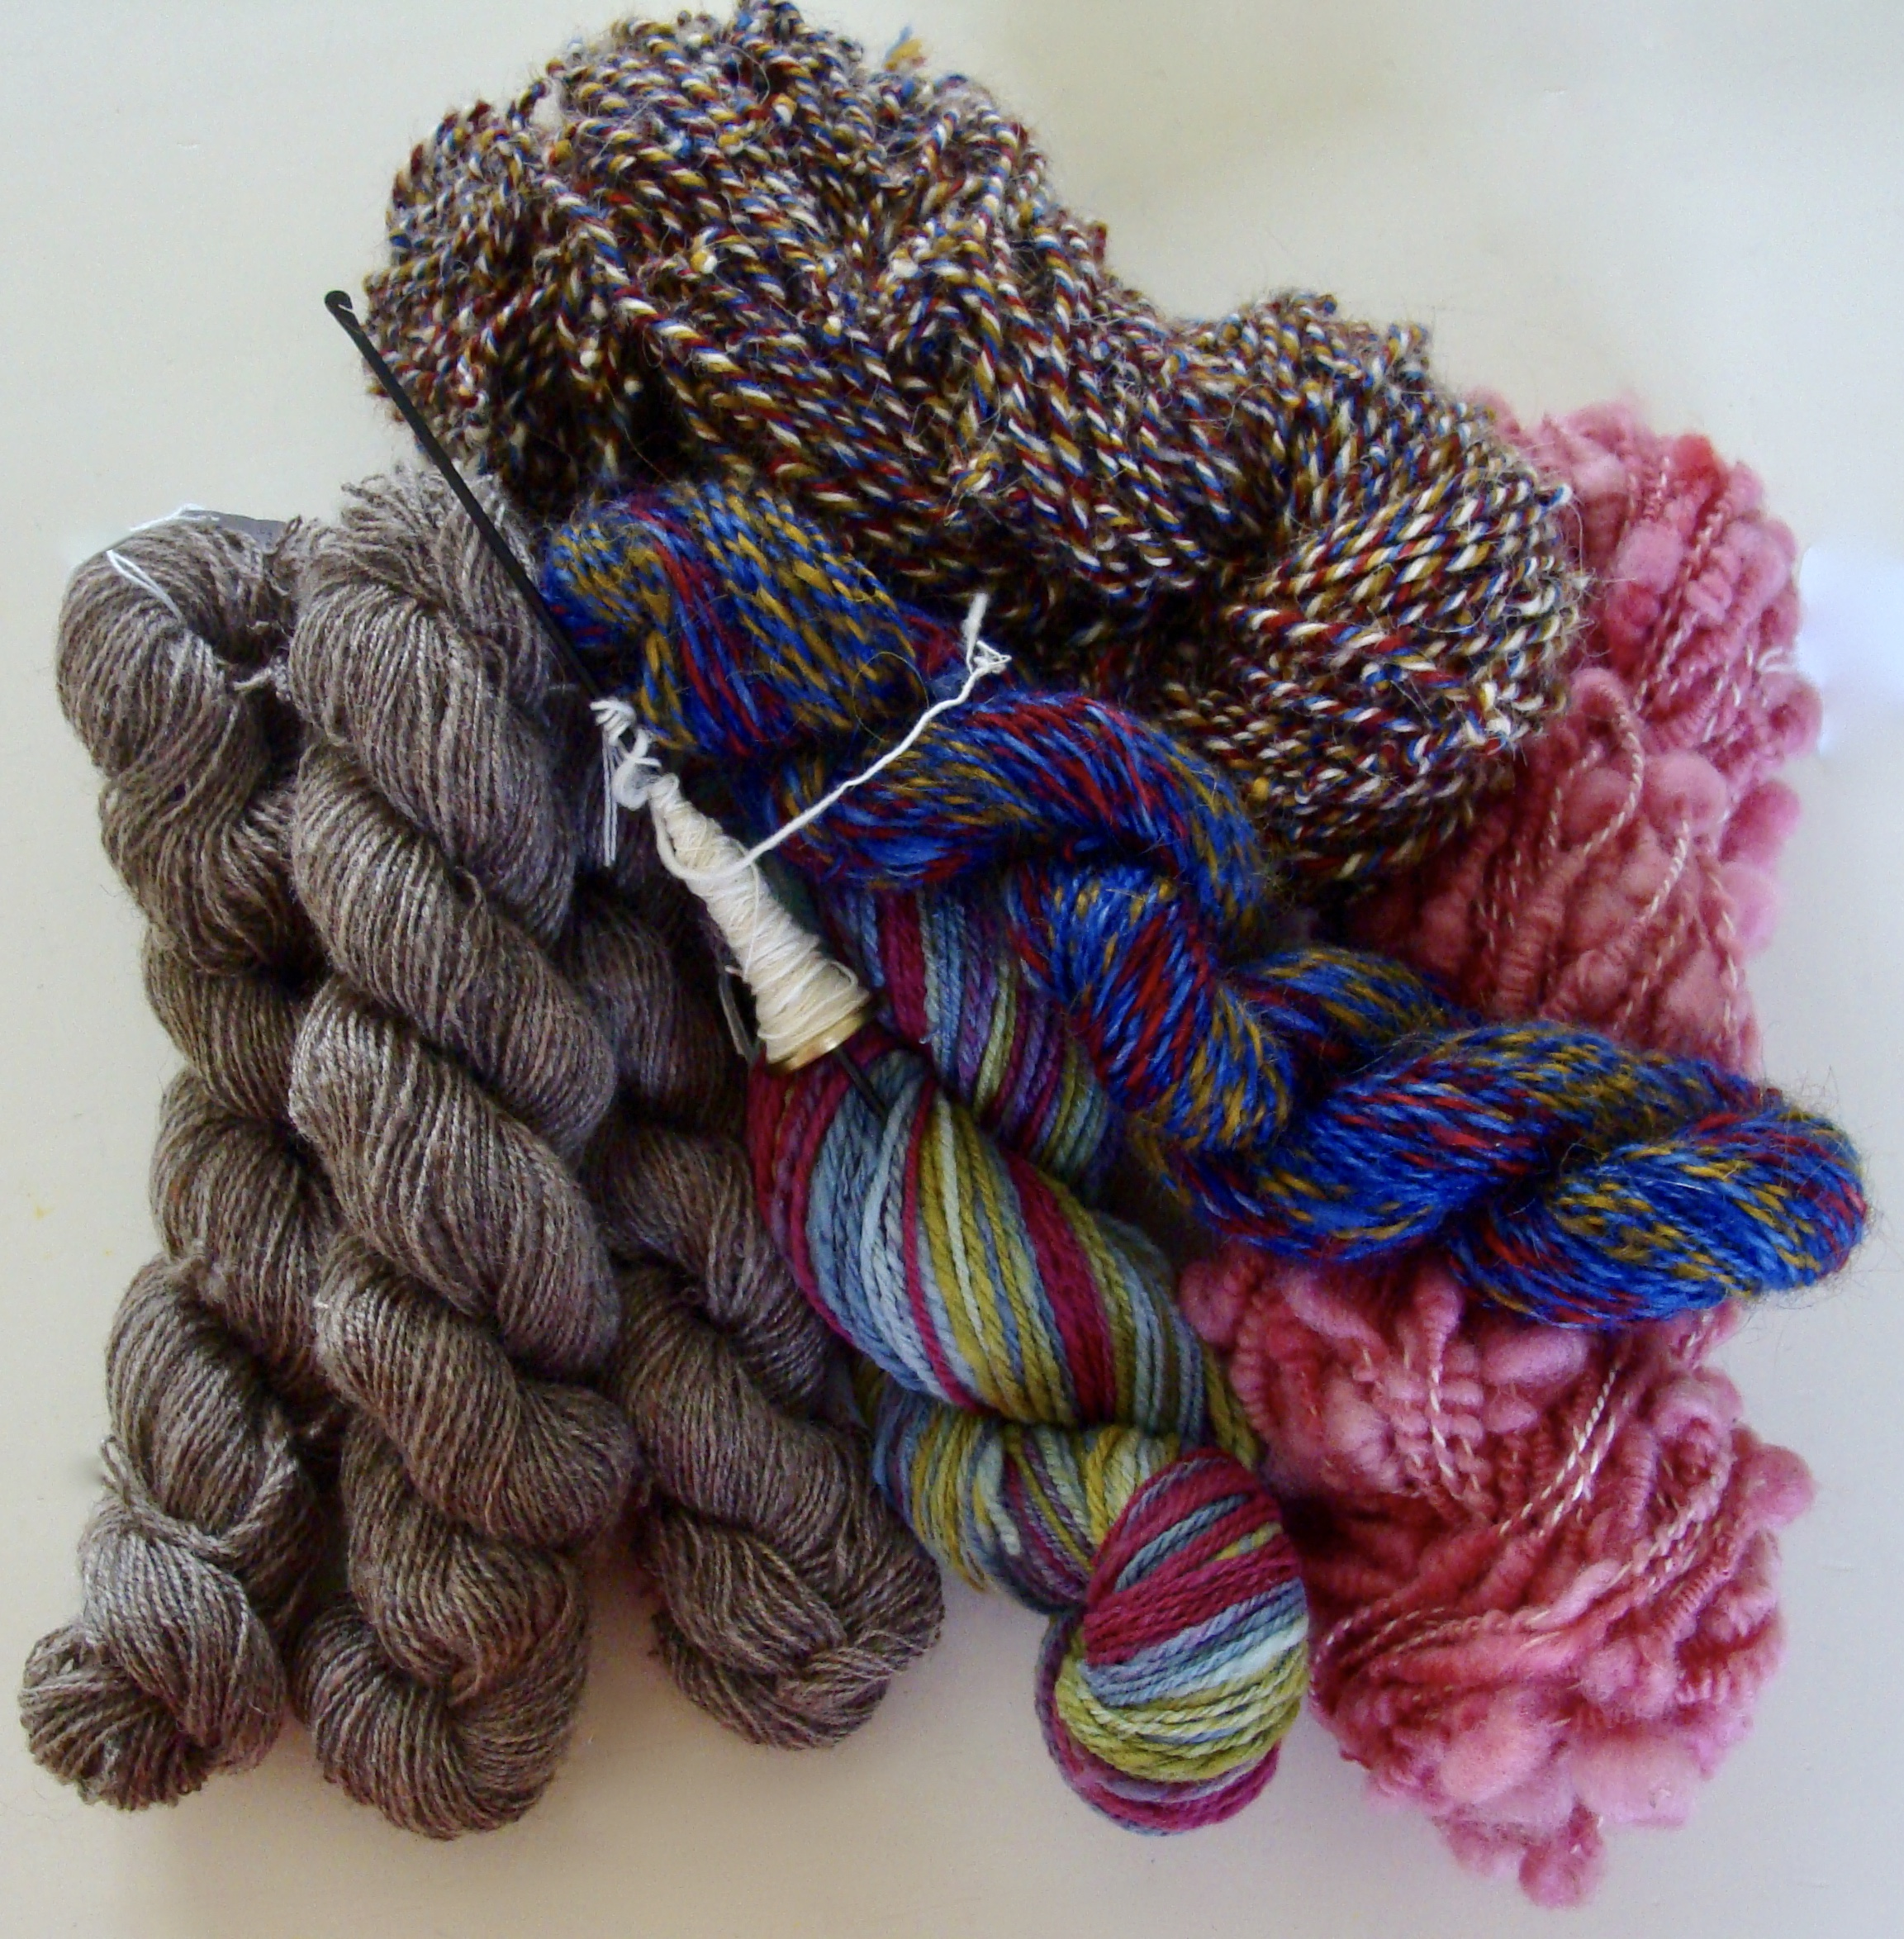 2017 Tour de Fleece finished handspan yarn